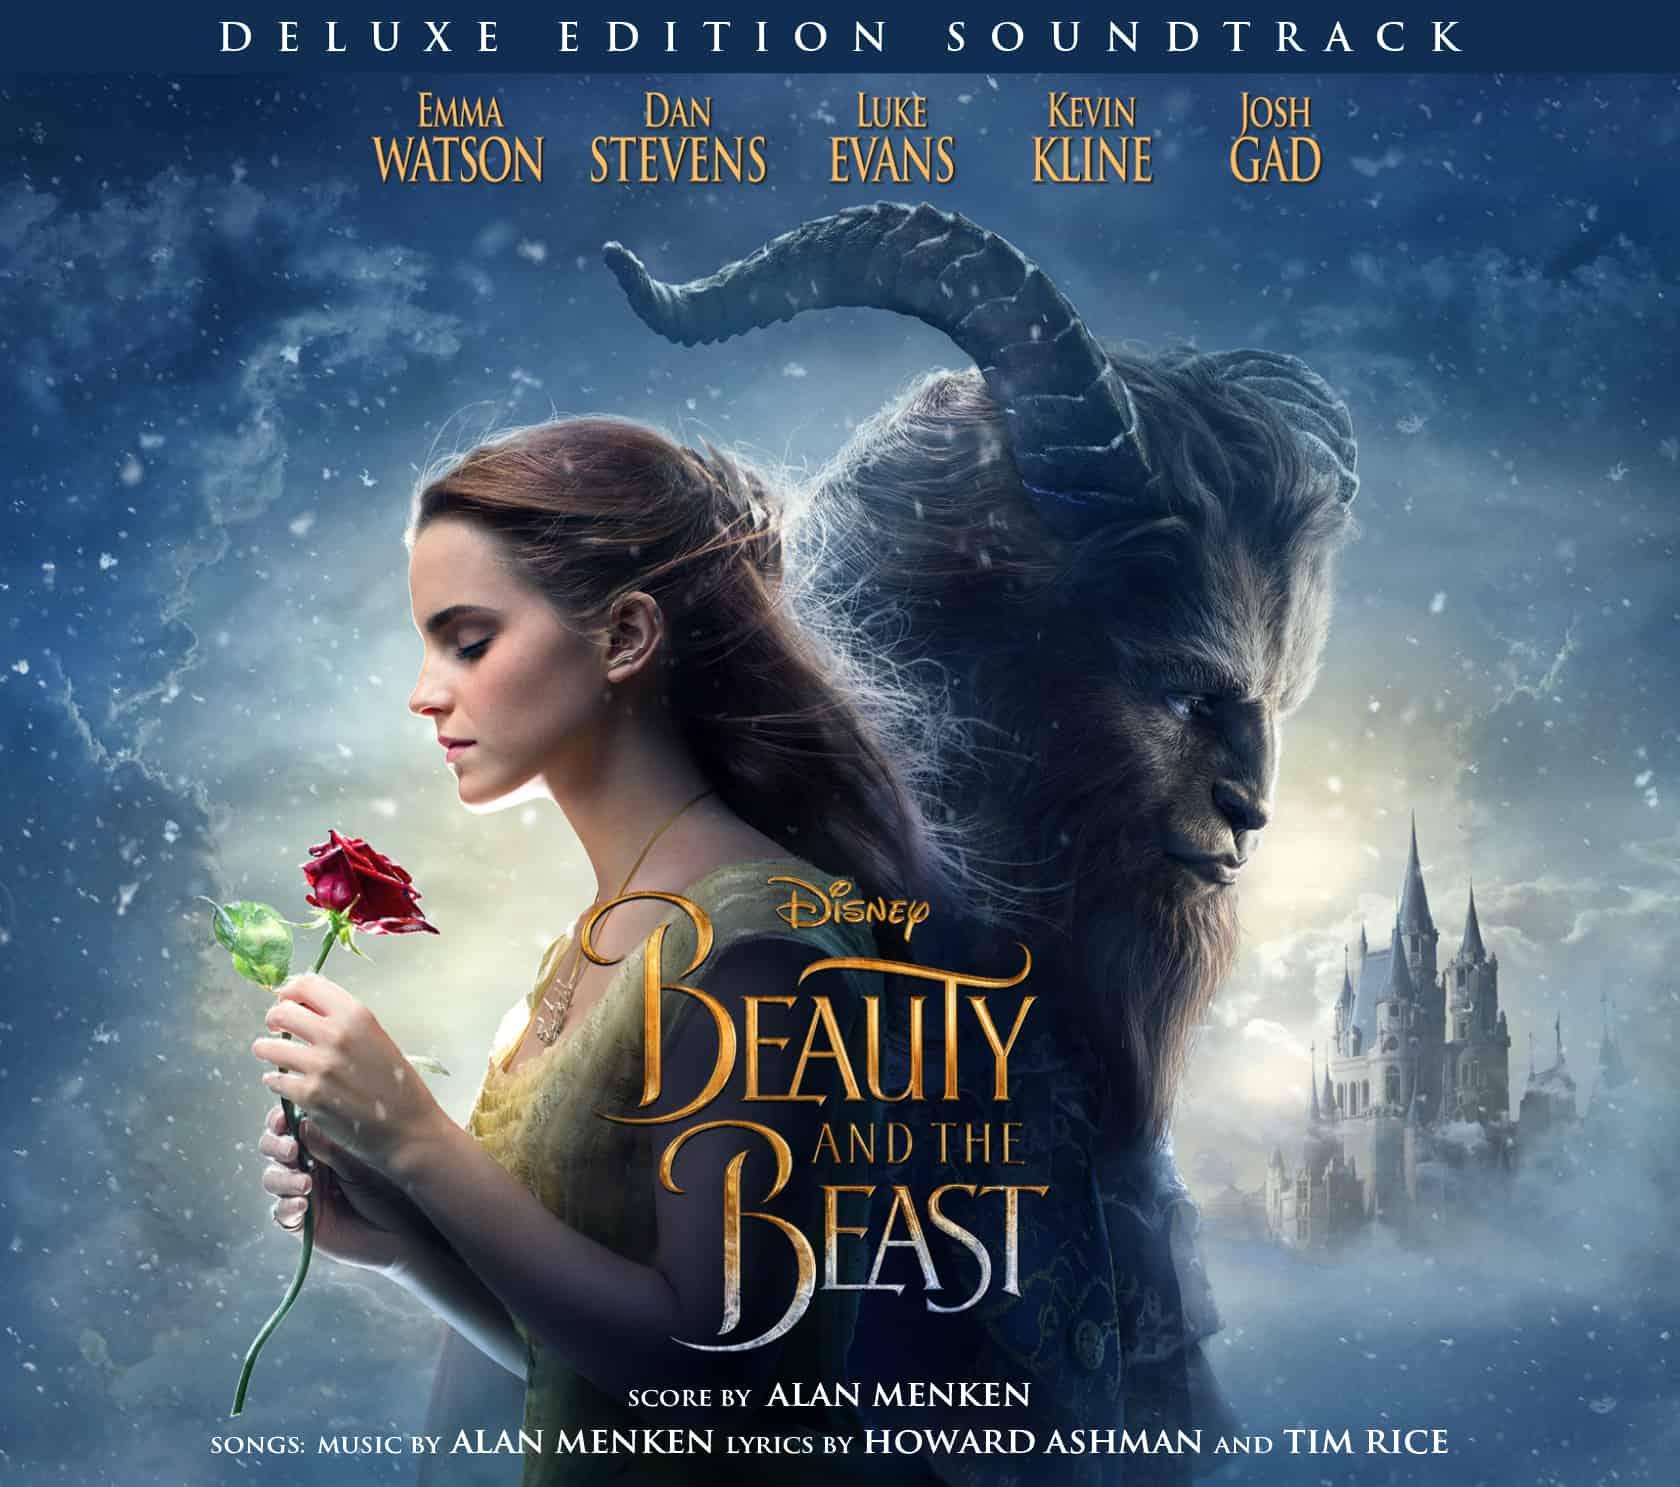 Beauty And The Beast, Disney Movie, Music Score Alan Menken